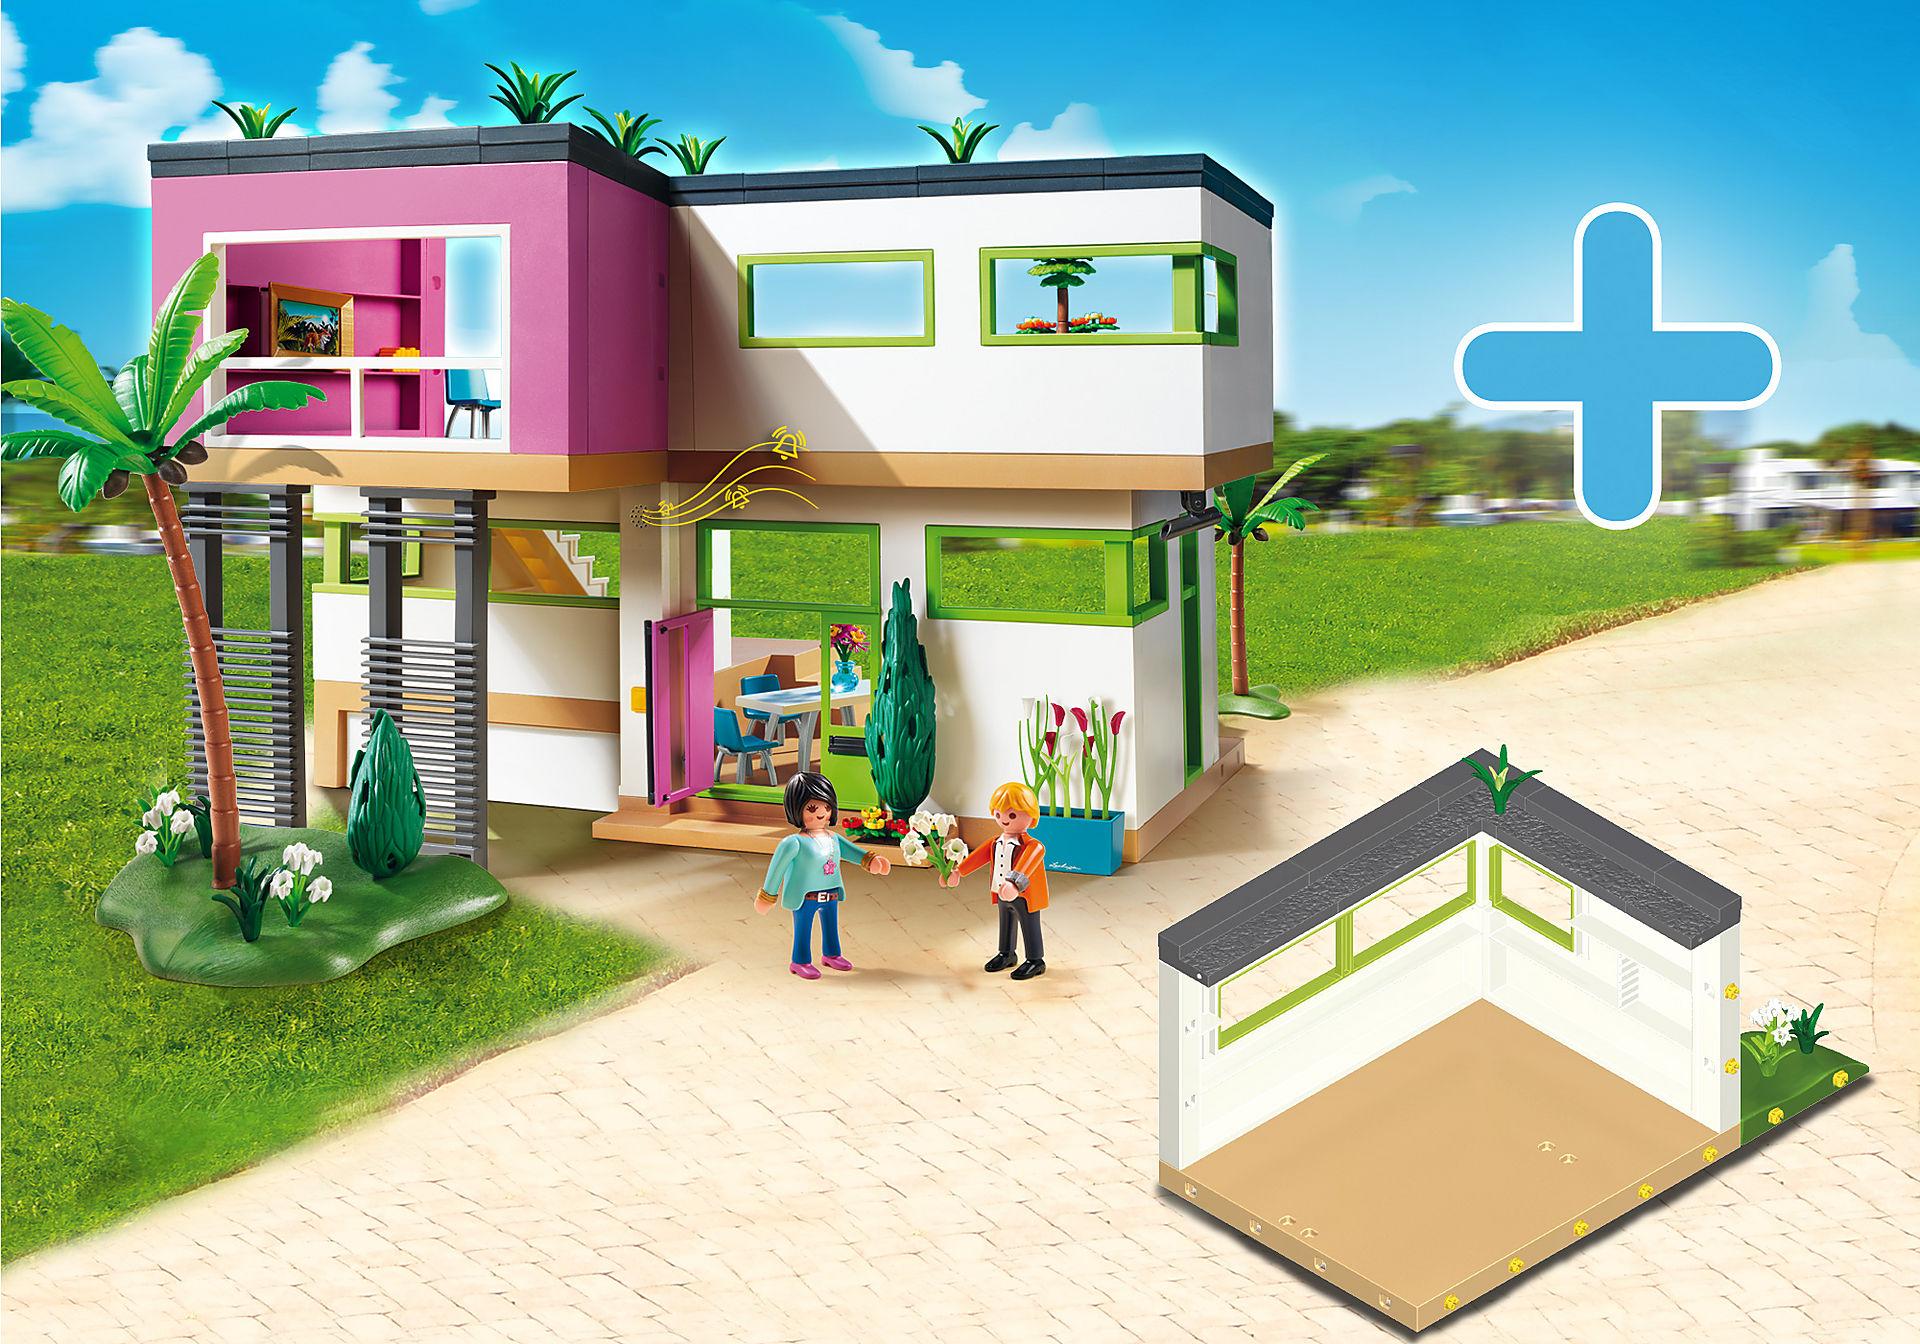 http://media.playmobil.com/i/playmobil/PM1905K_product_detail/Pack Promocional  da Moradia Moderna de Luxo